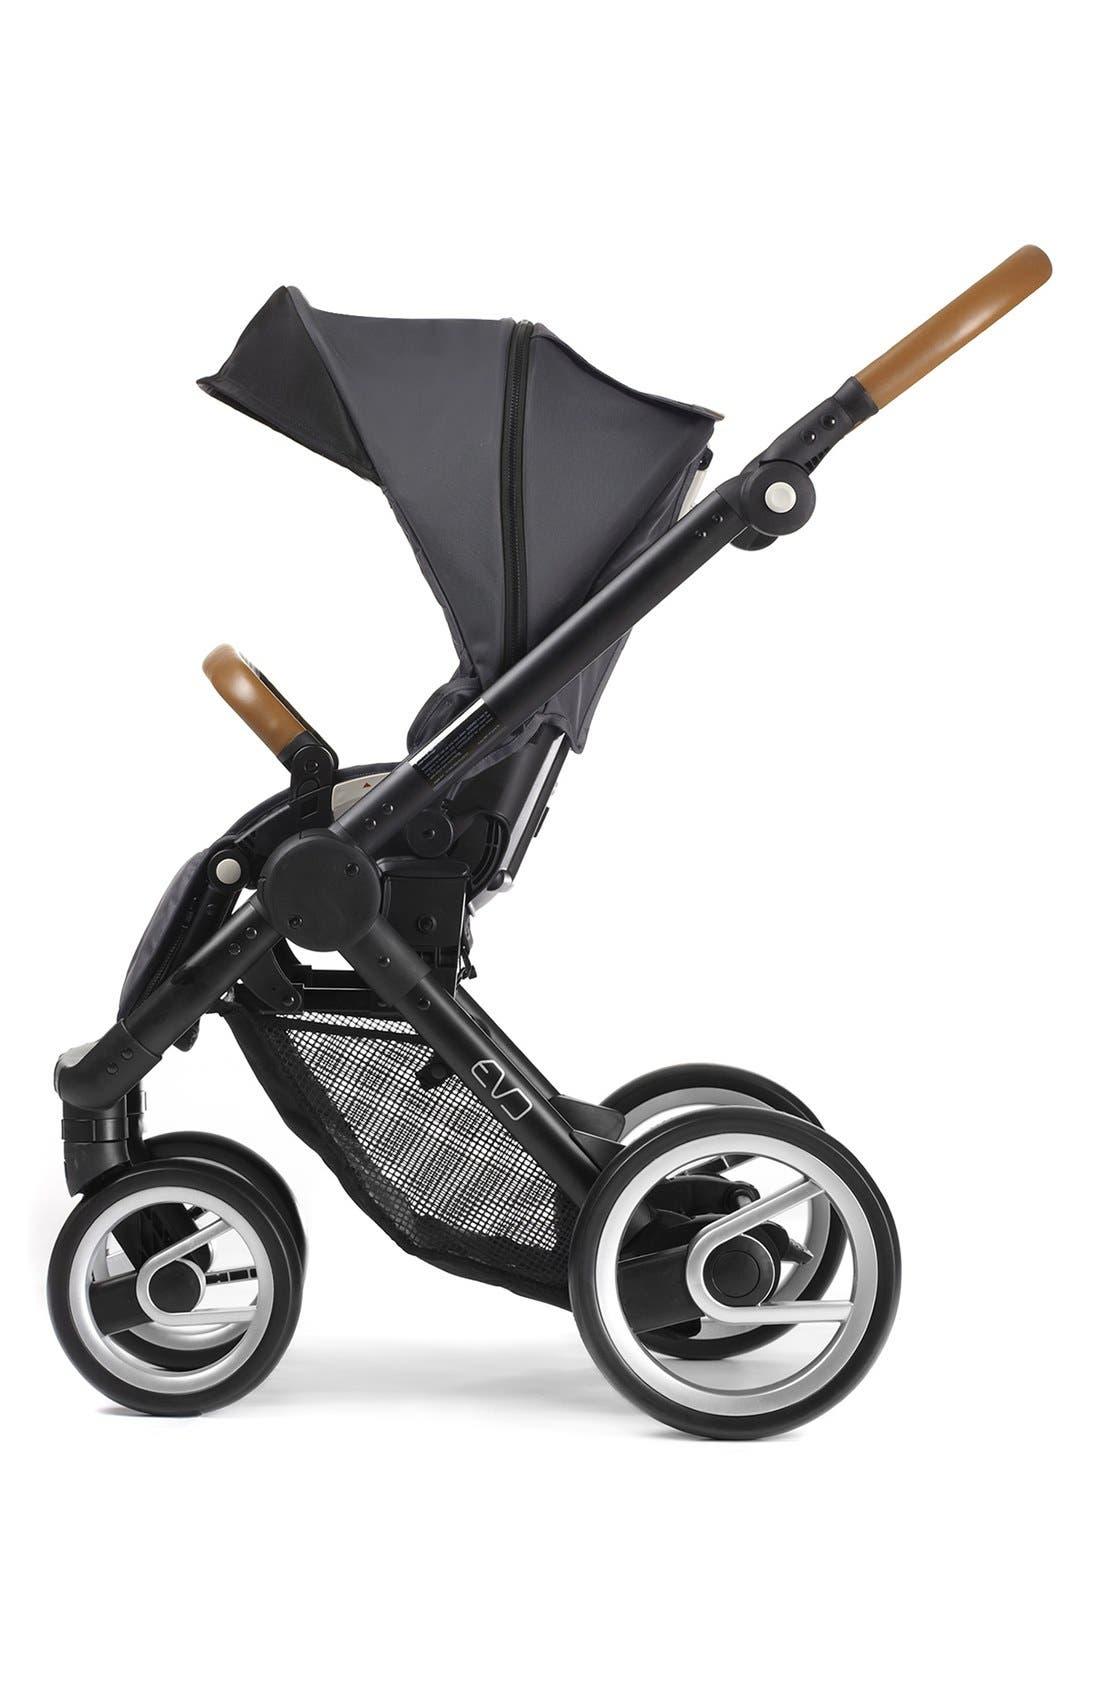 Mutsy 'Evo - Urban Nomad' Stroller